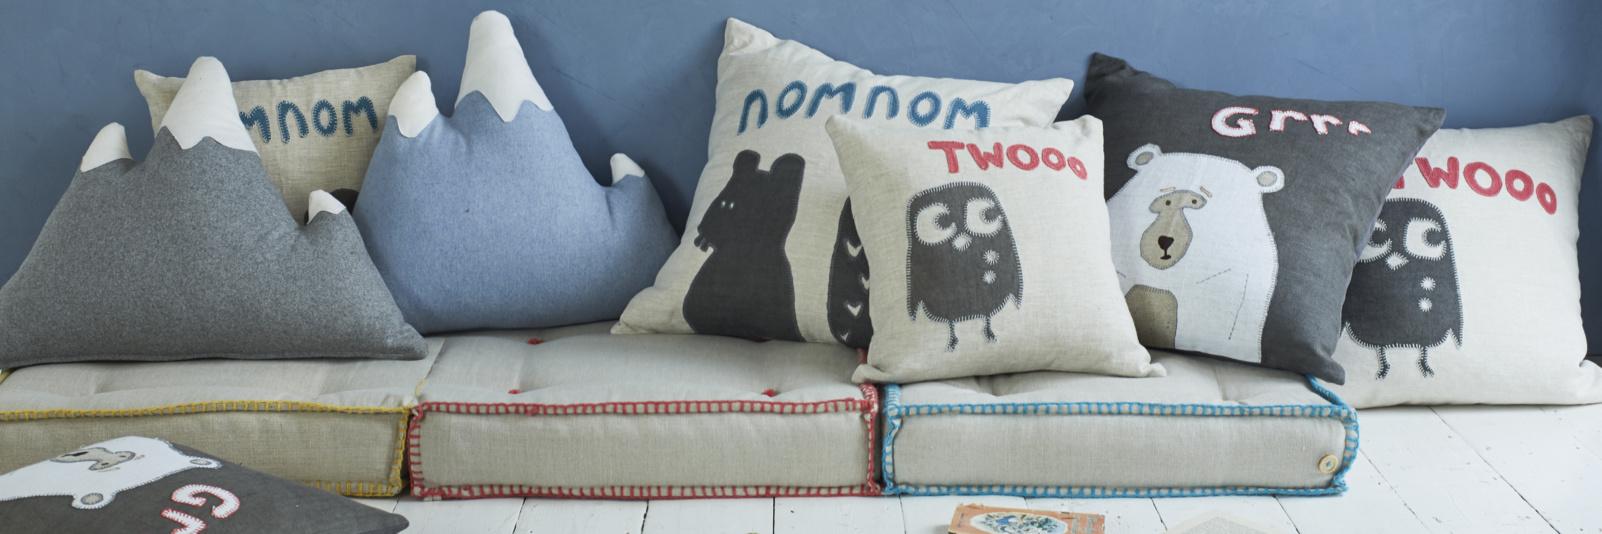 Children's cool cushions and soft furnishings